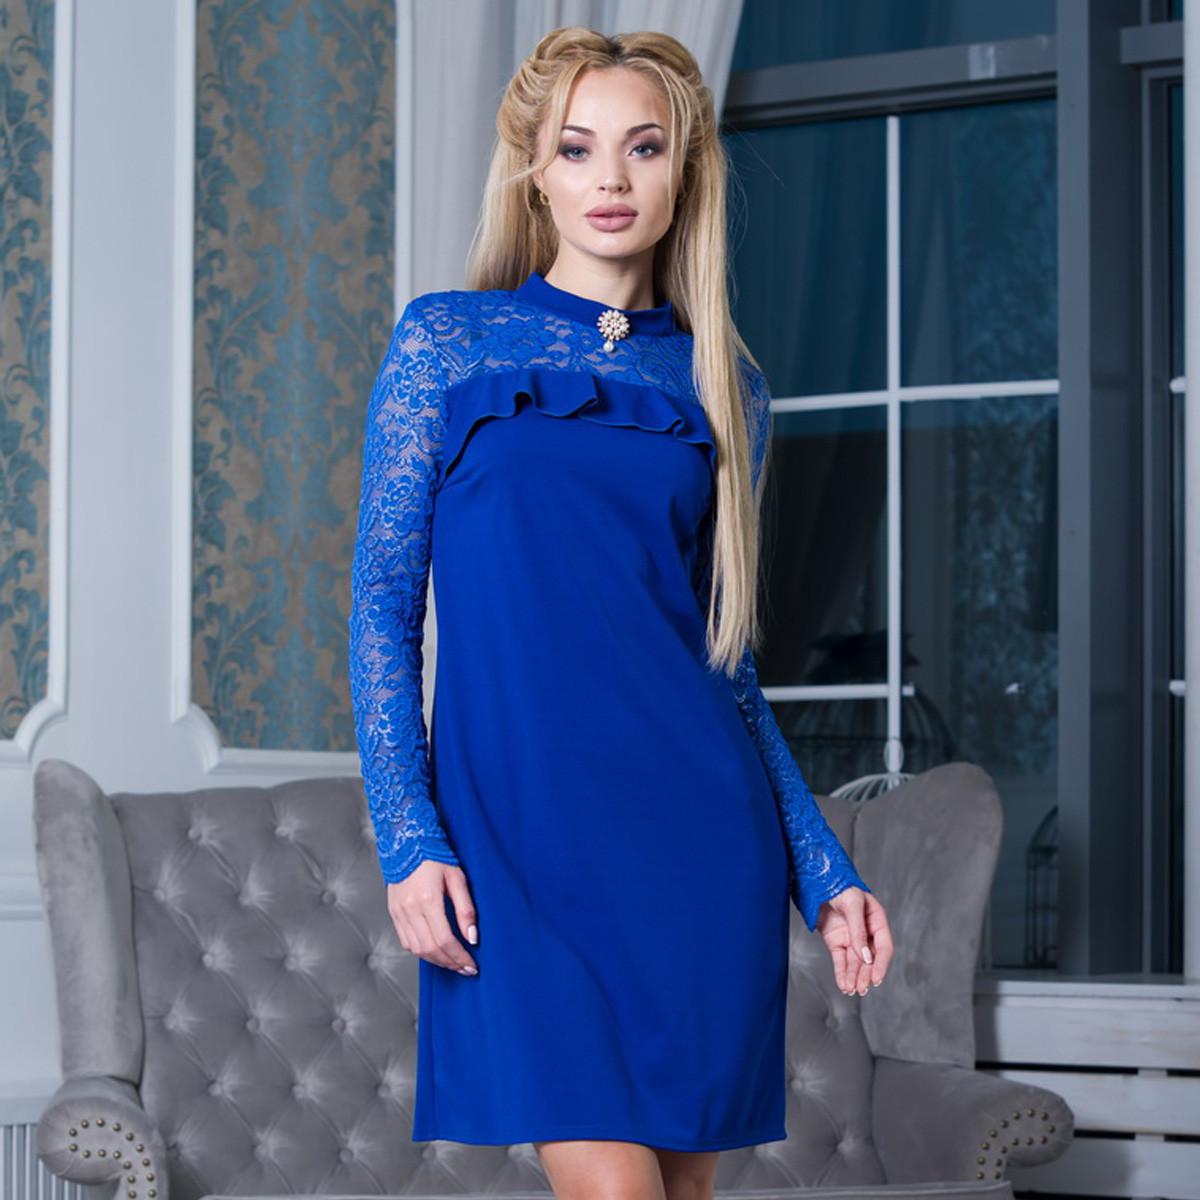 982f3bc76fa Модное короткое платье с гипюром размер S